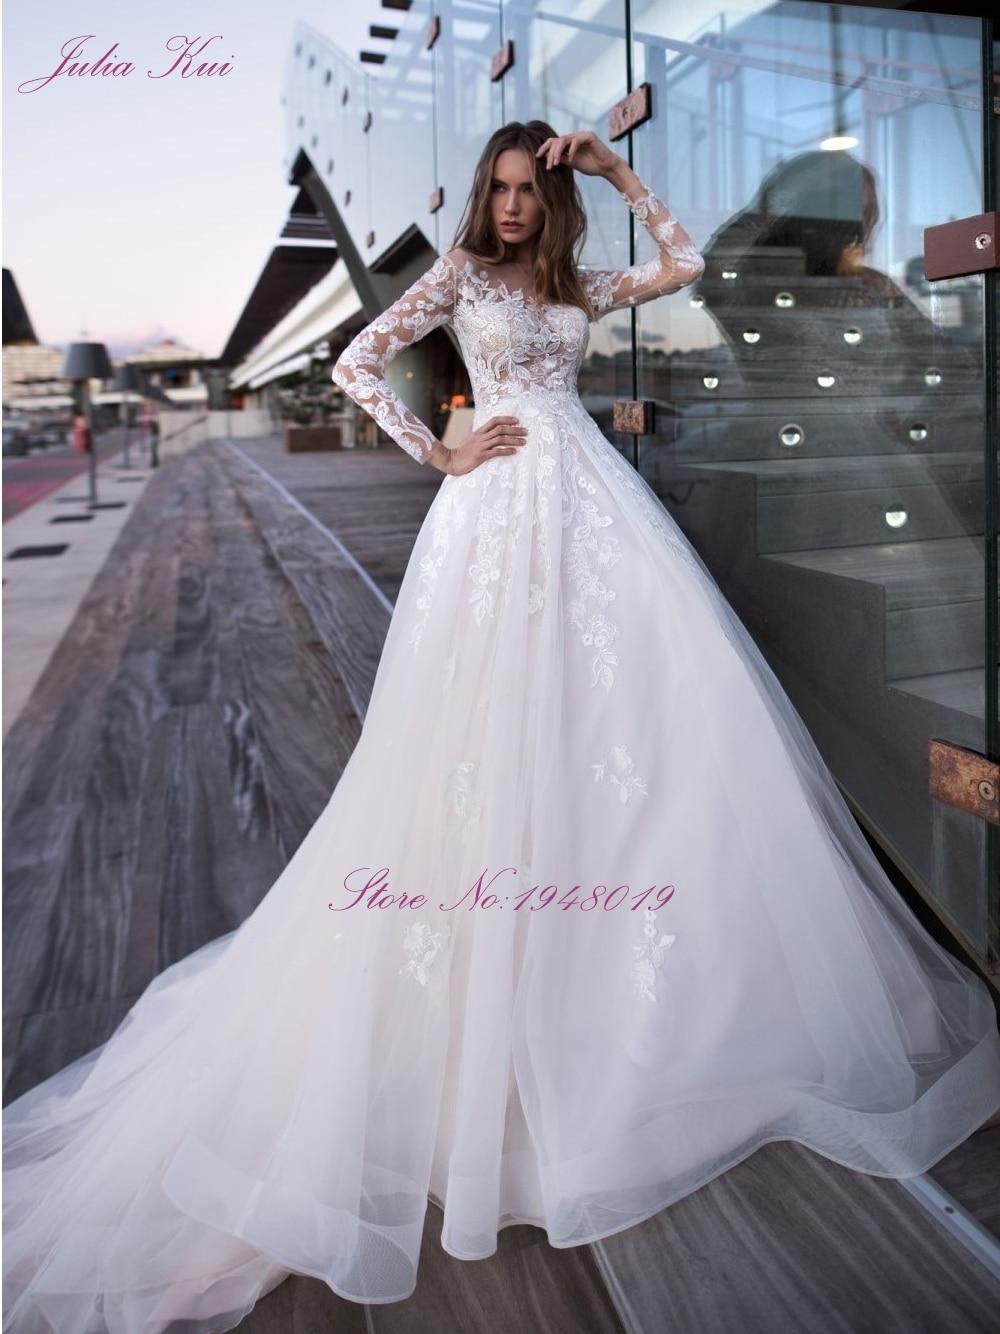 Julia Kui Robe De Mariage Full Sleeve Button Back A Line Wedding Dress Elegant Scoop Appliques Lace Floor Length Bridal Dress-in Wedding Dresses from Weddings & Events    3